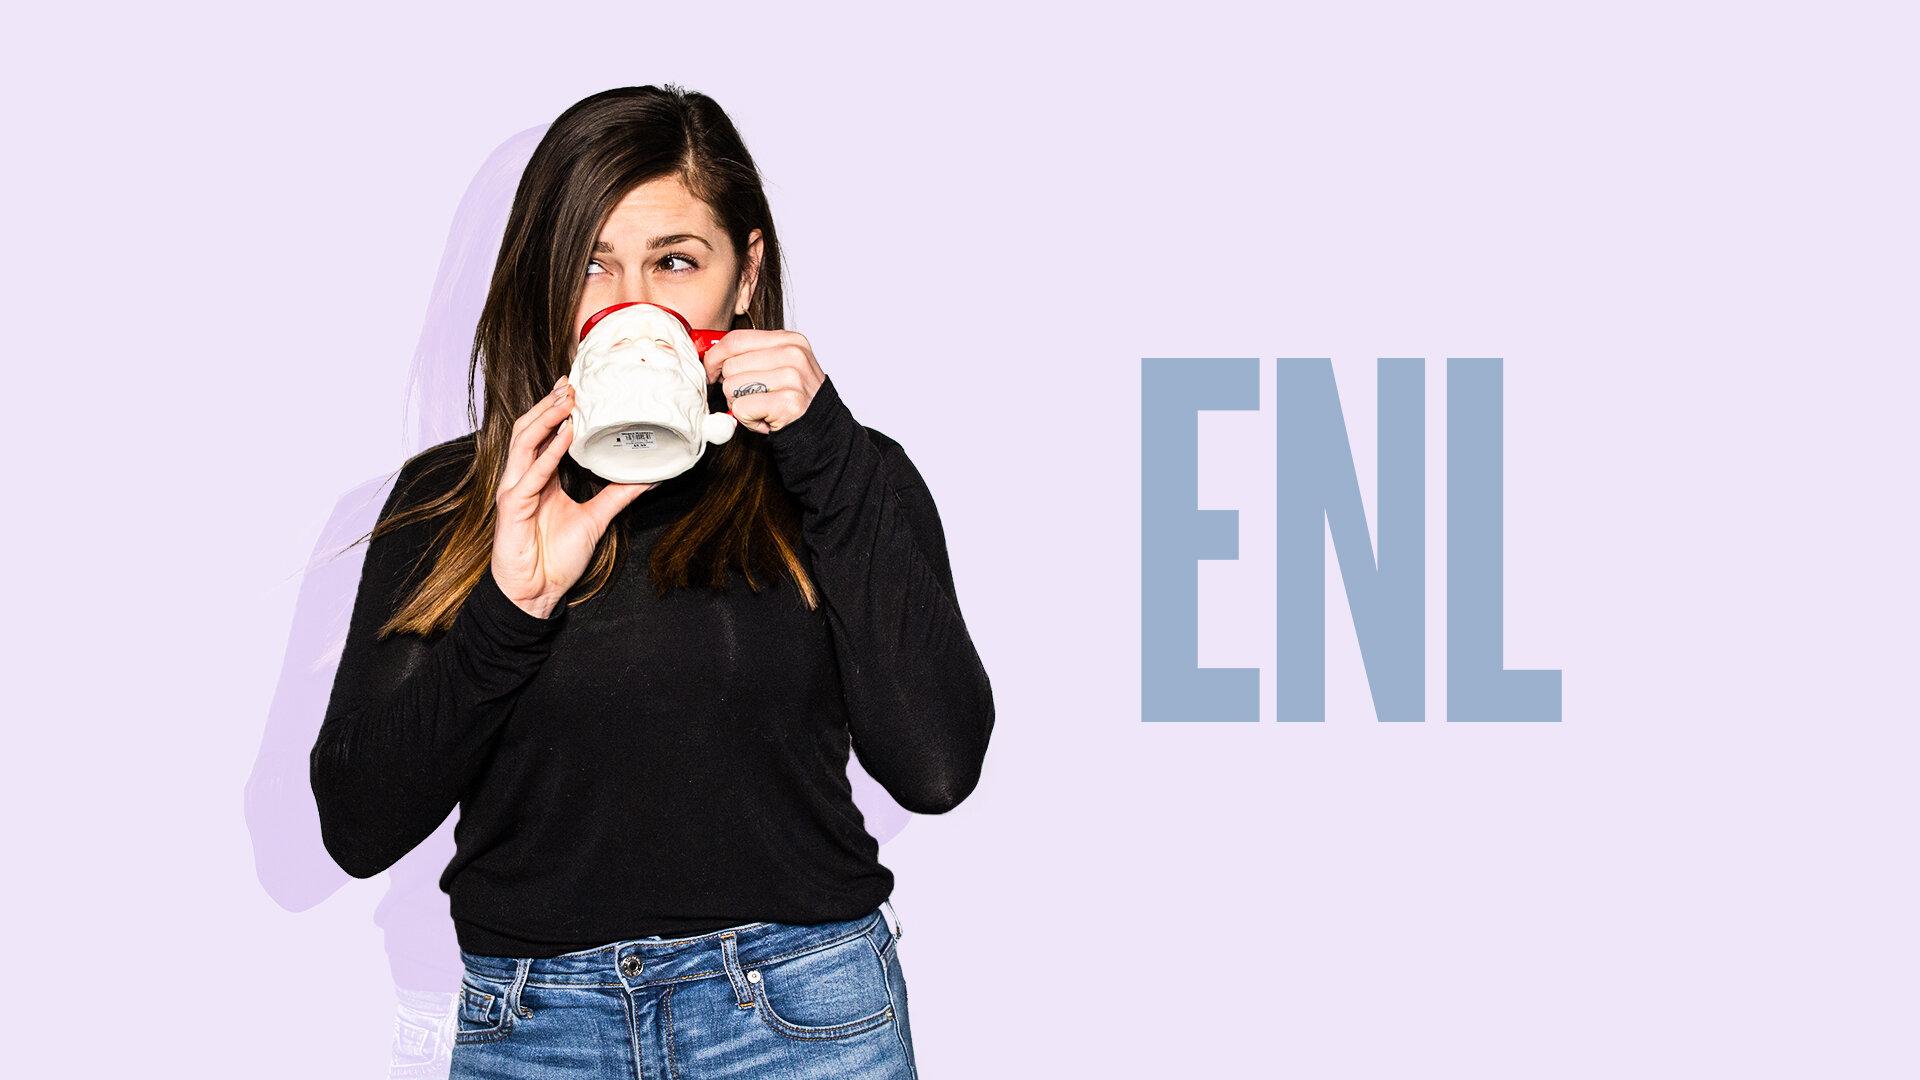 ENL_3.jpg